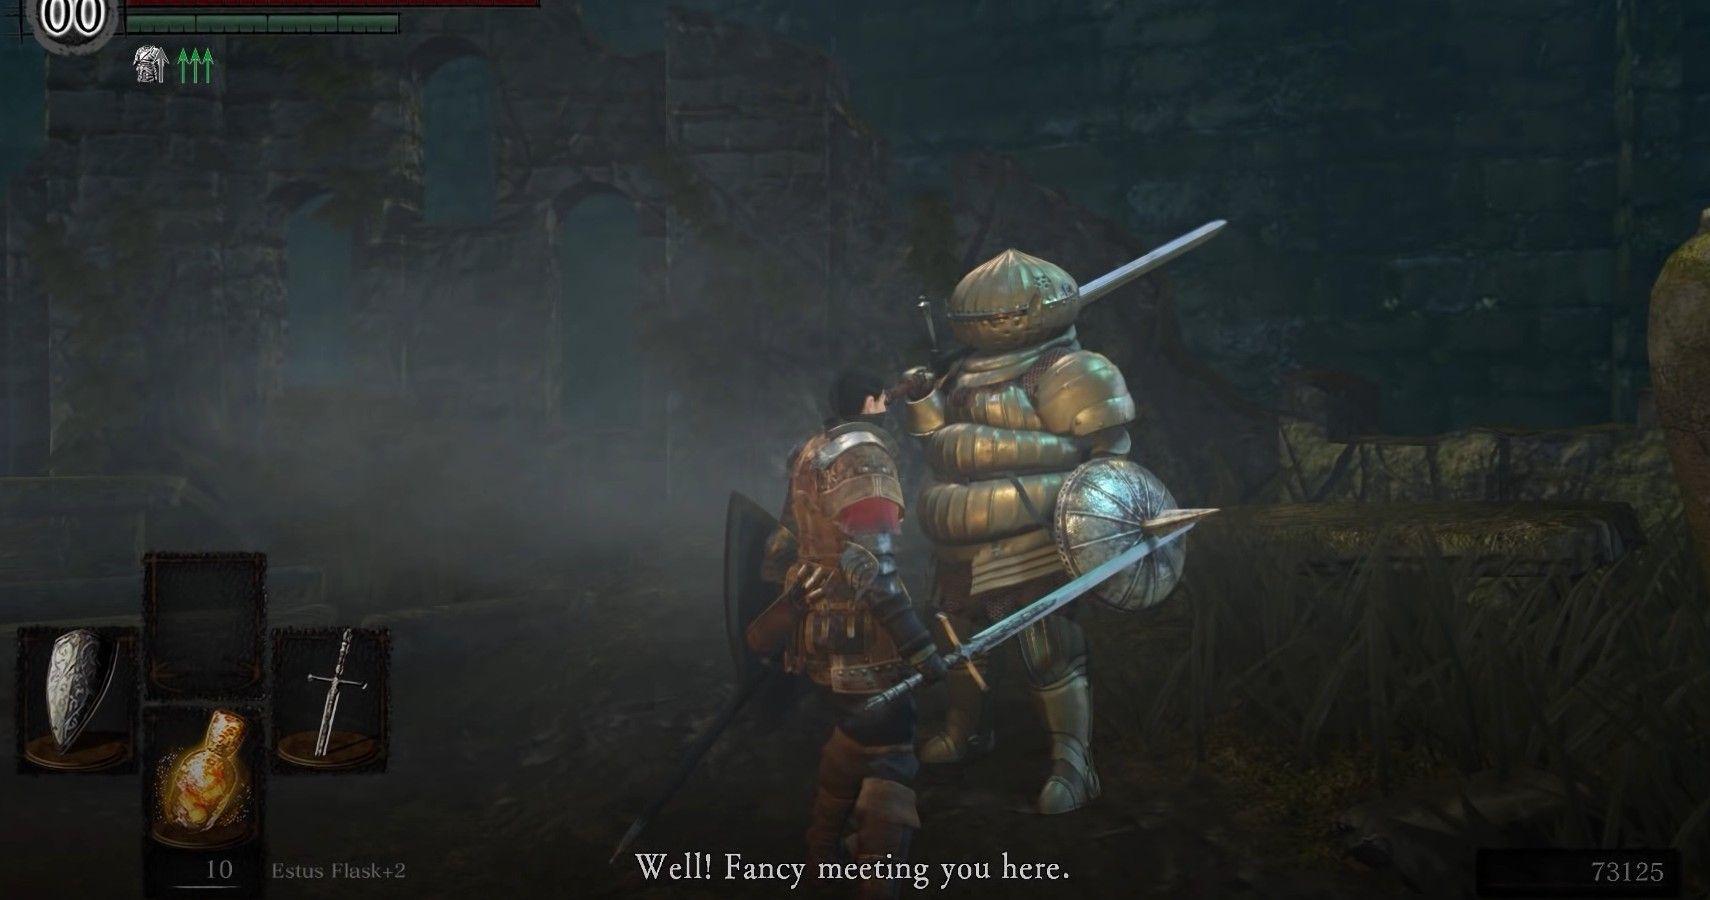 Dark Souls: Siegmeyer's Questline, A Step By Step Guide